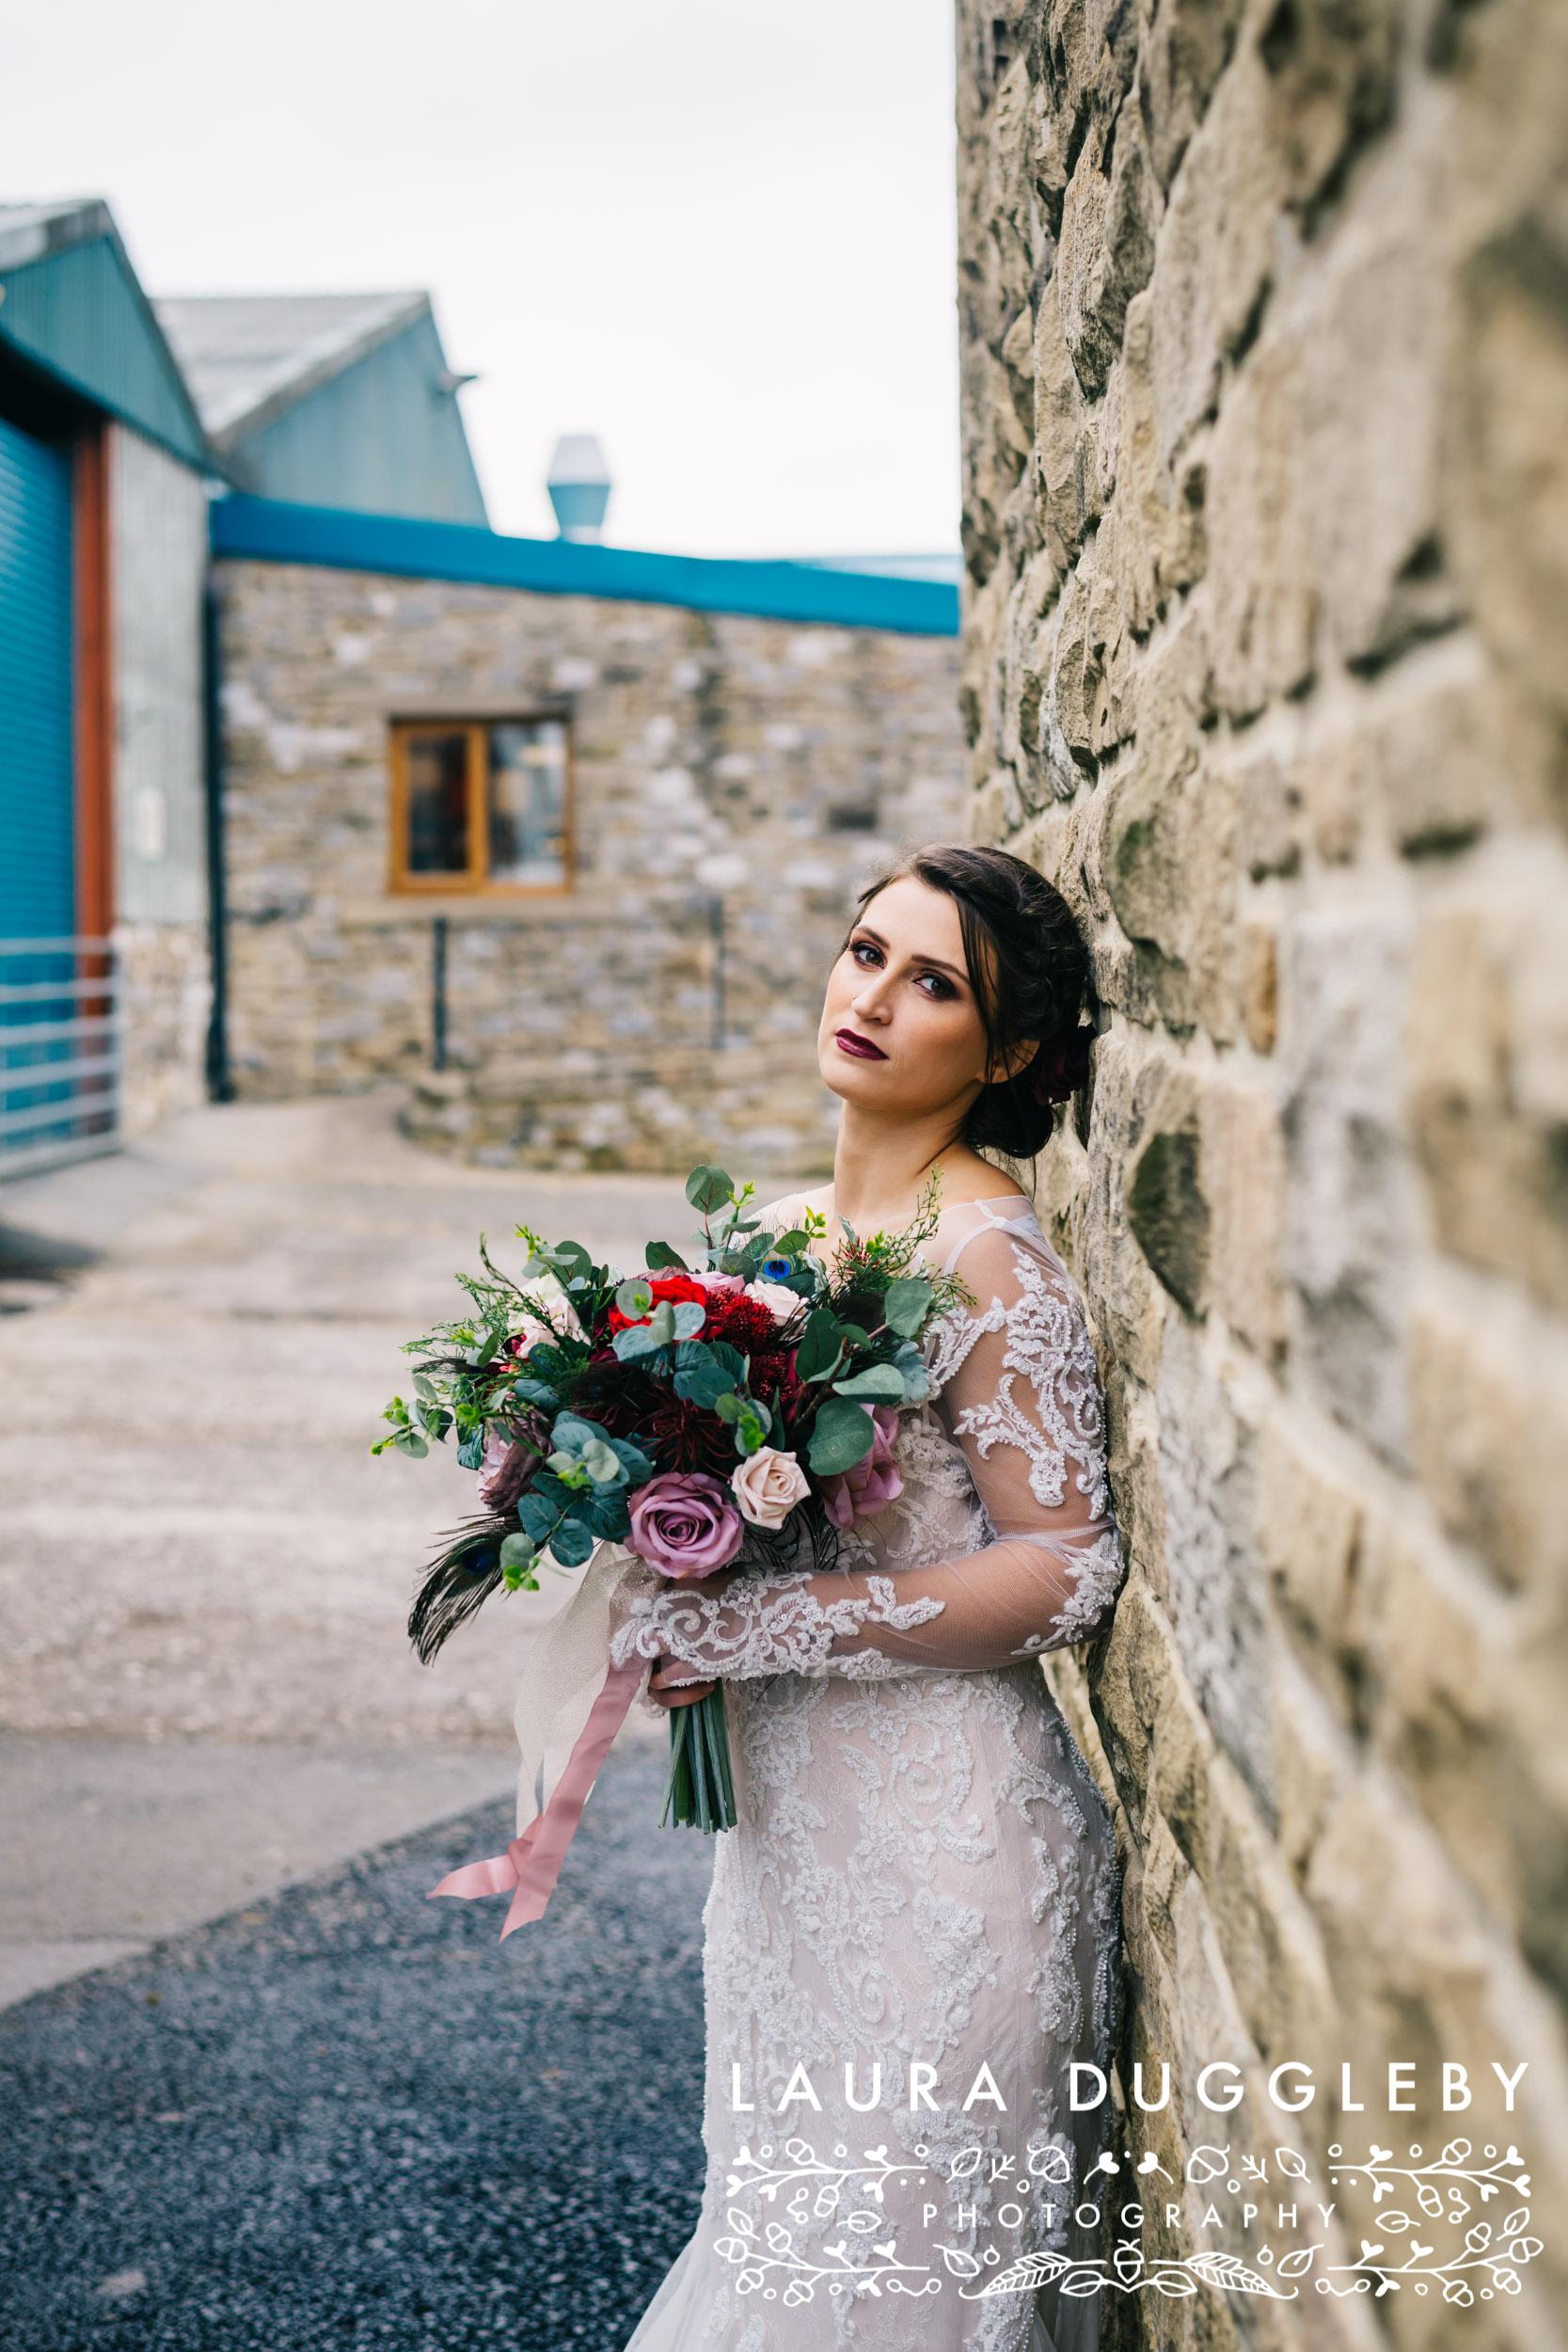 Skipton Wedding Photographer - Thornton Hall Country Park Wedding Photographer14